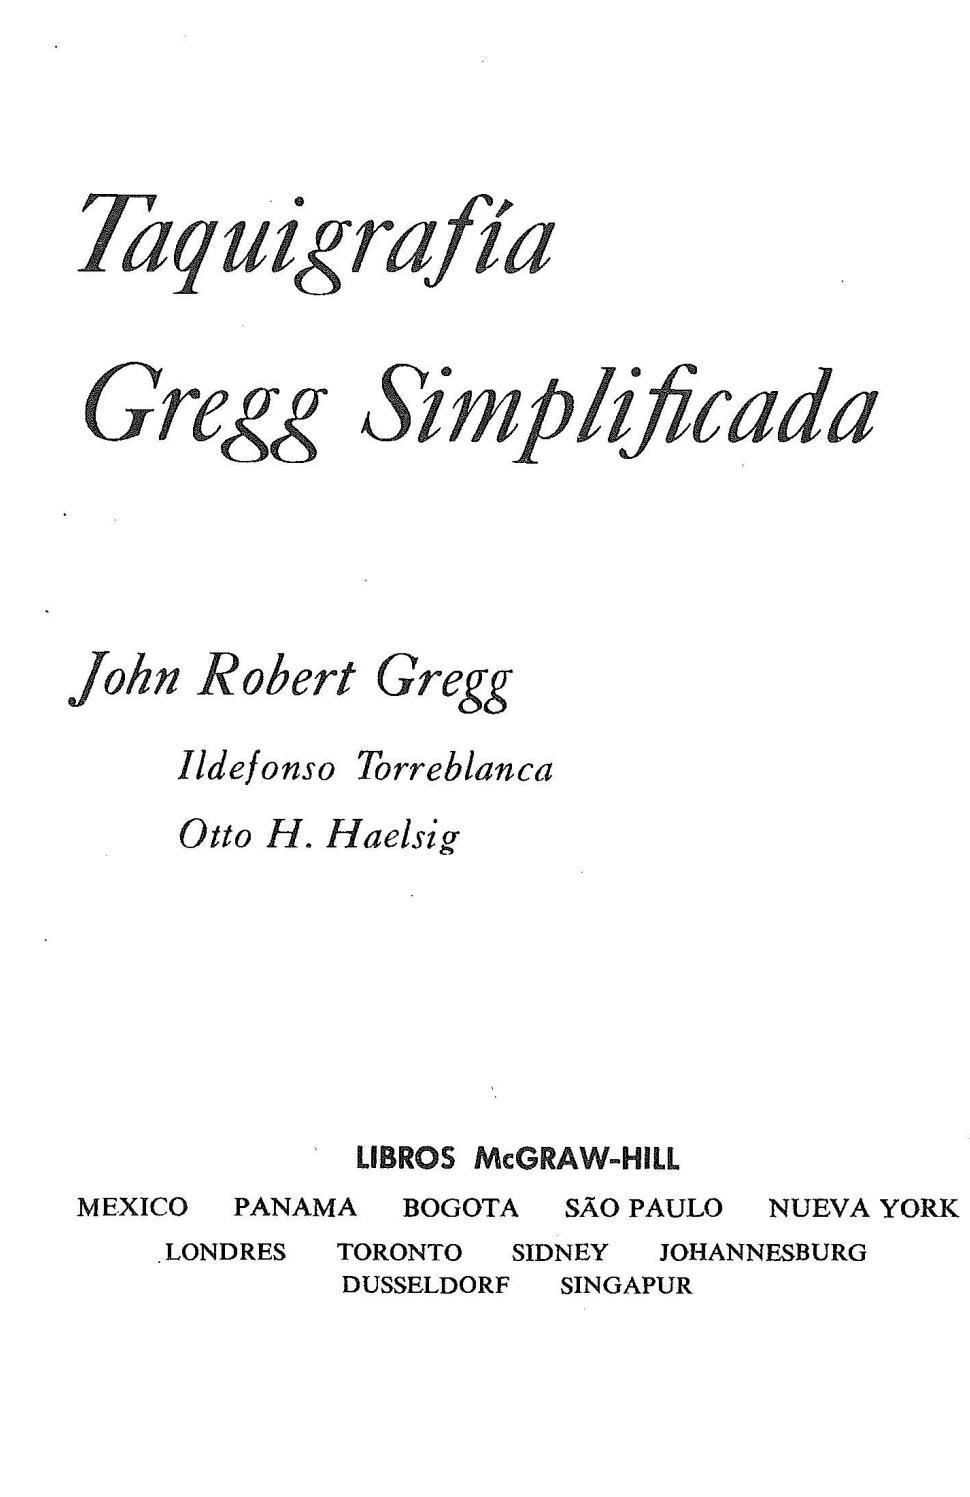 Taquigrafia gregg simplificada by Mario Edgar Nieto Velandia - issuu